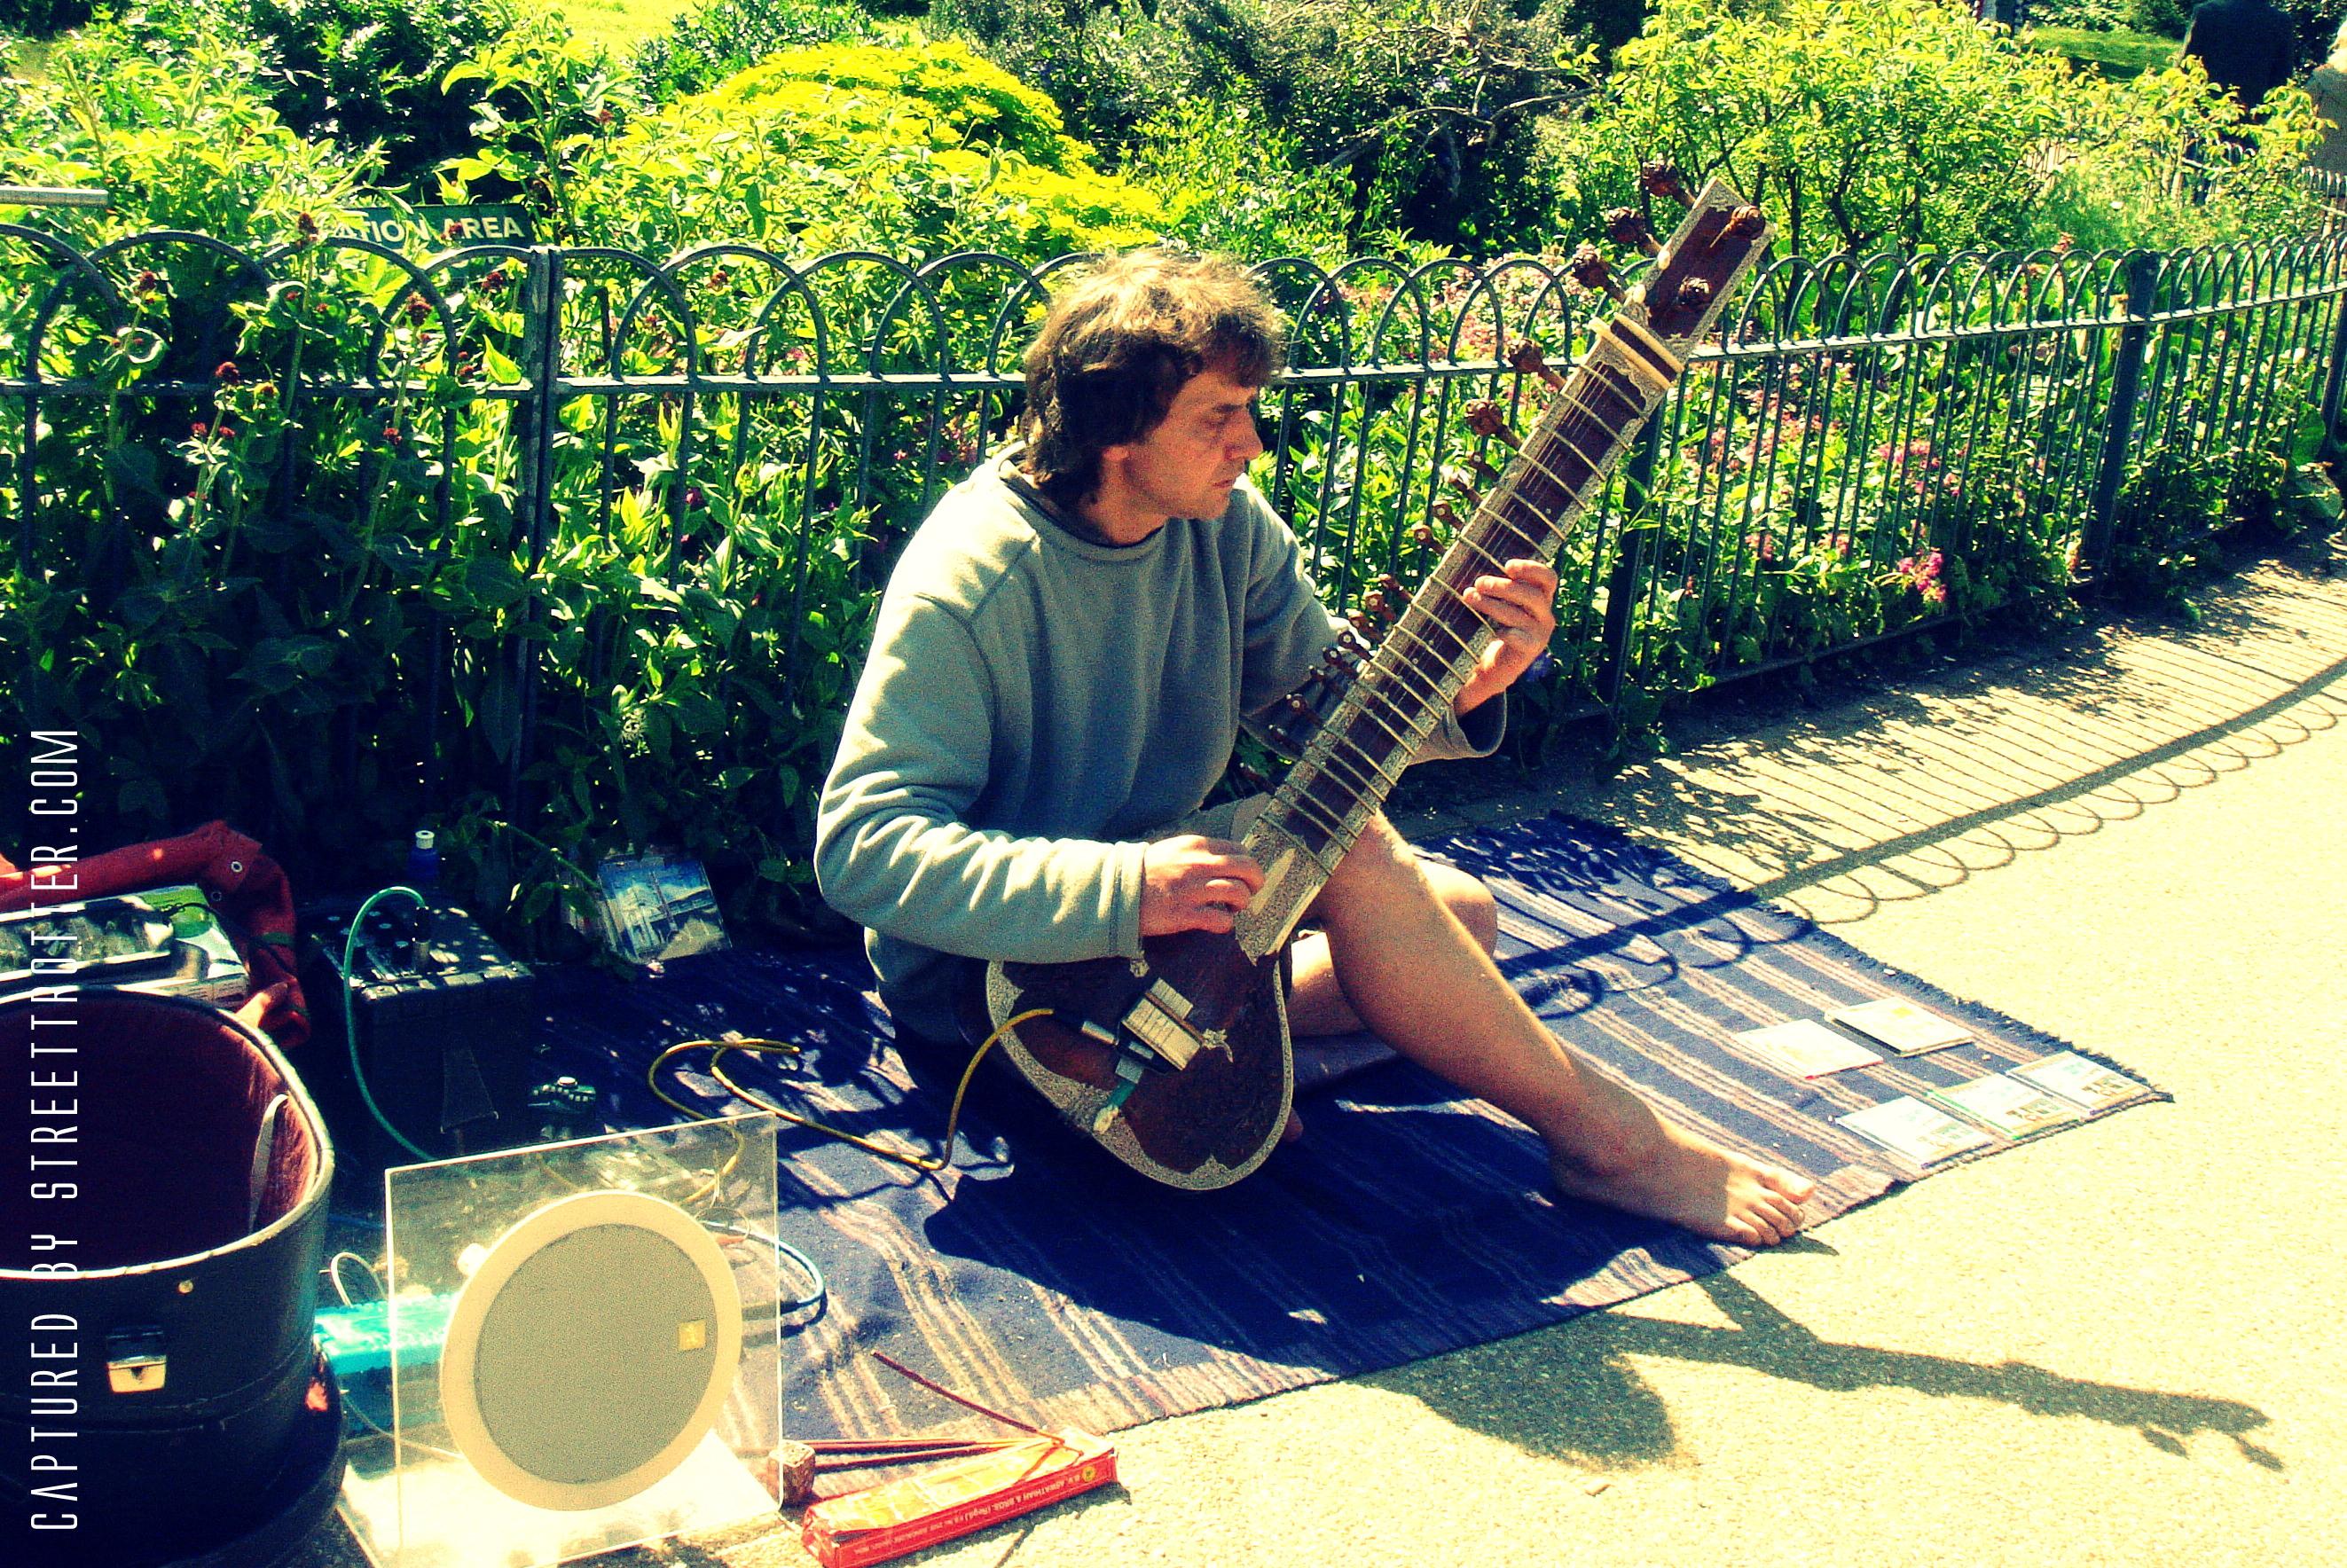 street musician - busking - street trotter